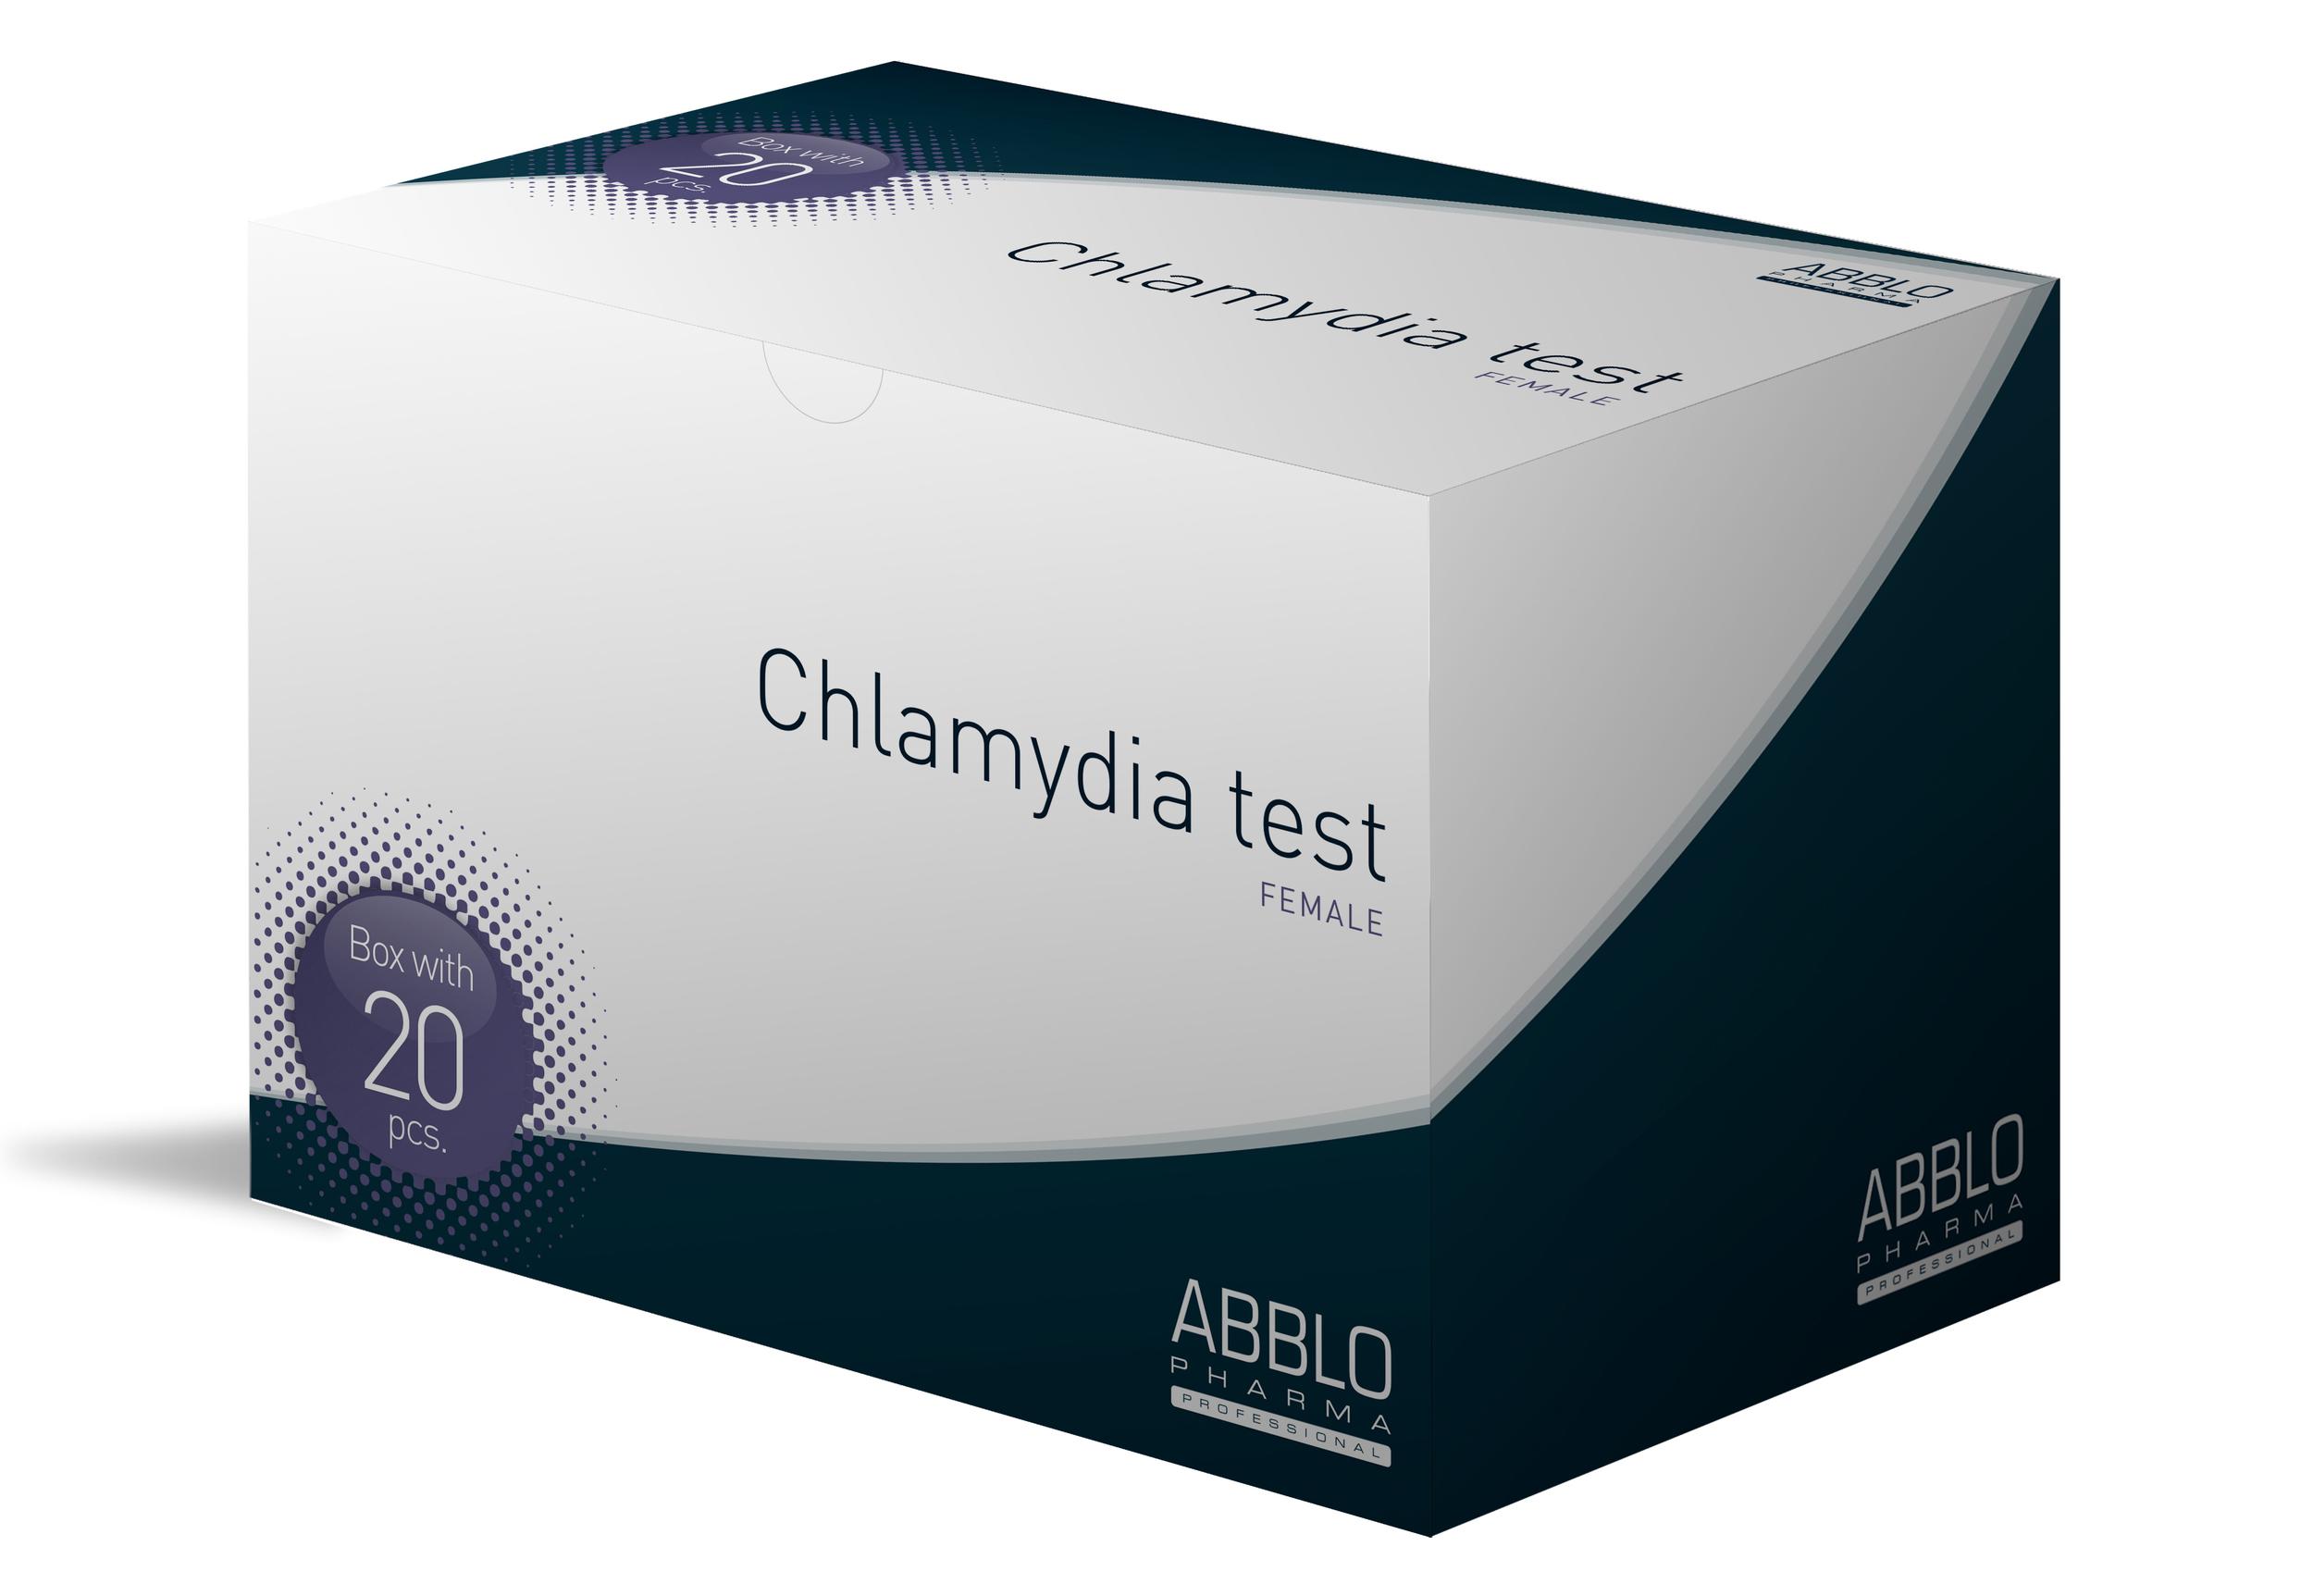 ABBLO_Pharma_Professionals_Female_Chlamydia